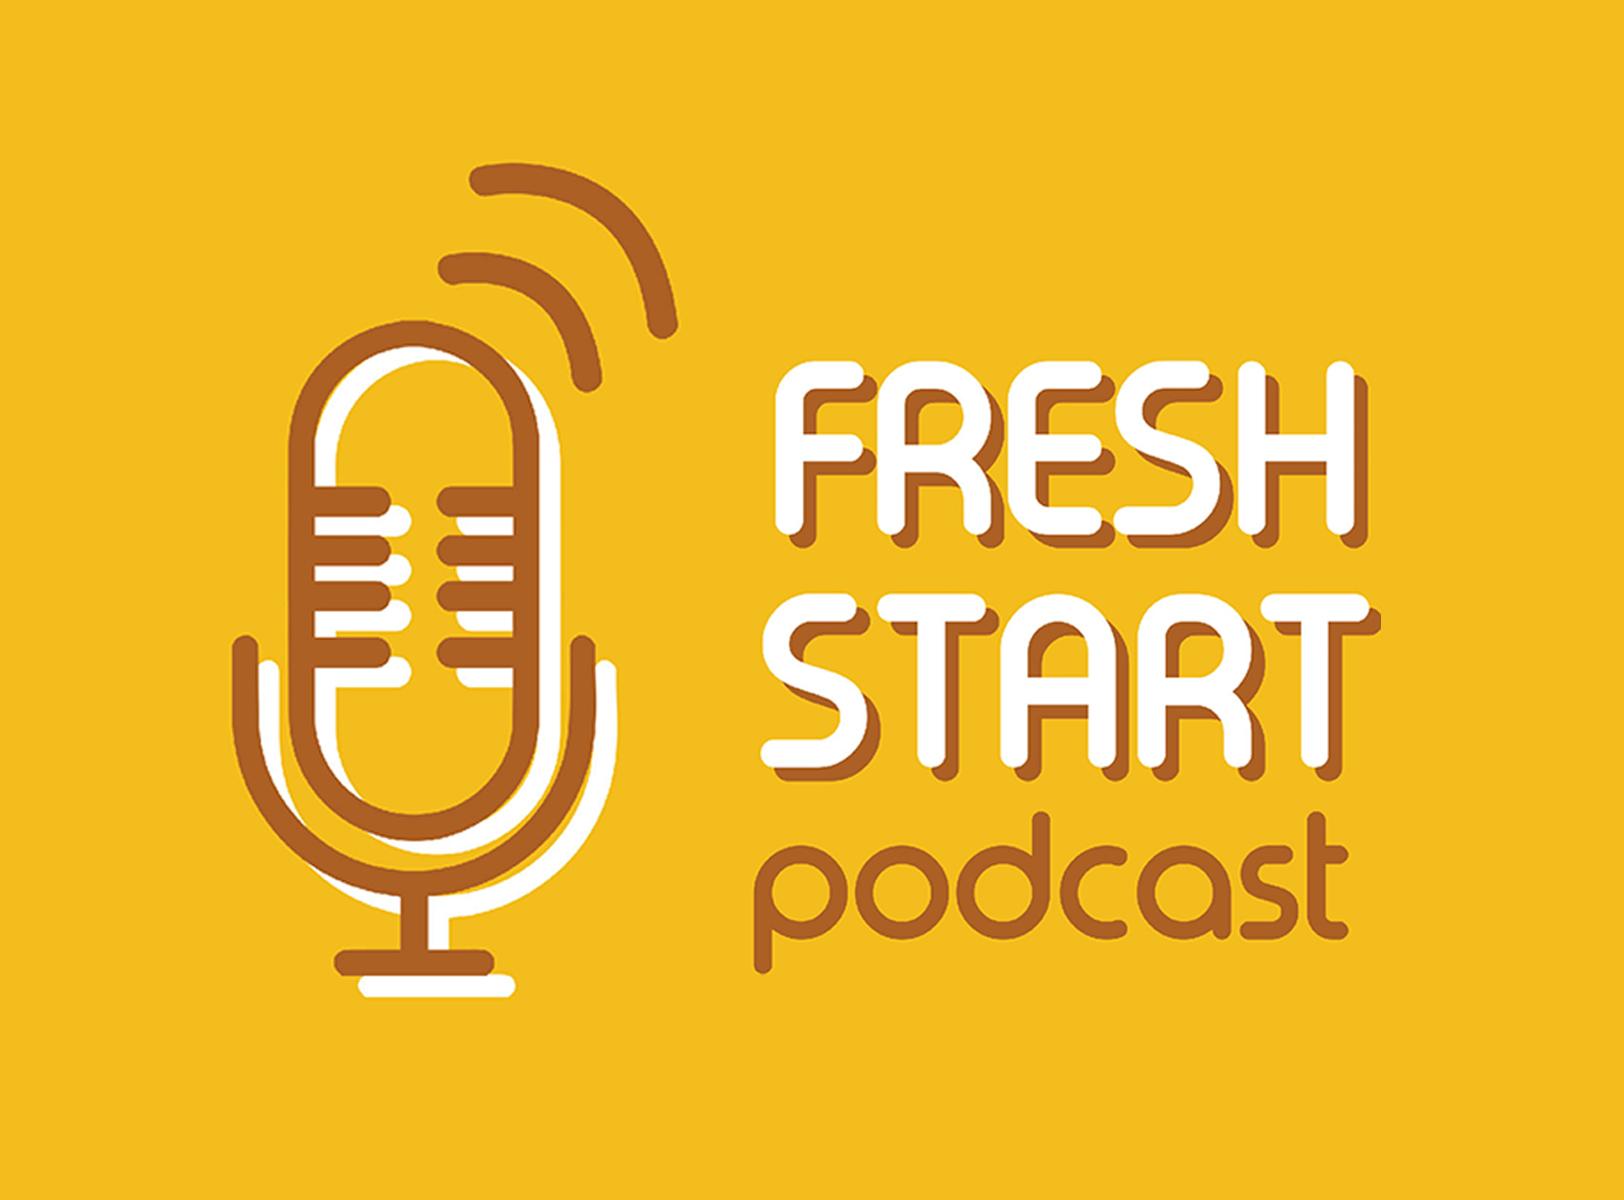 Fresh Start: Podcast News (12/3/2019 Tue.)